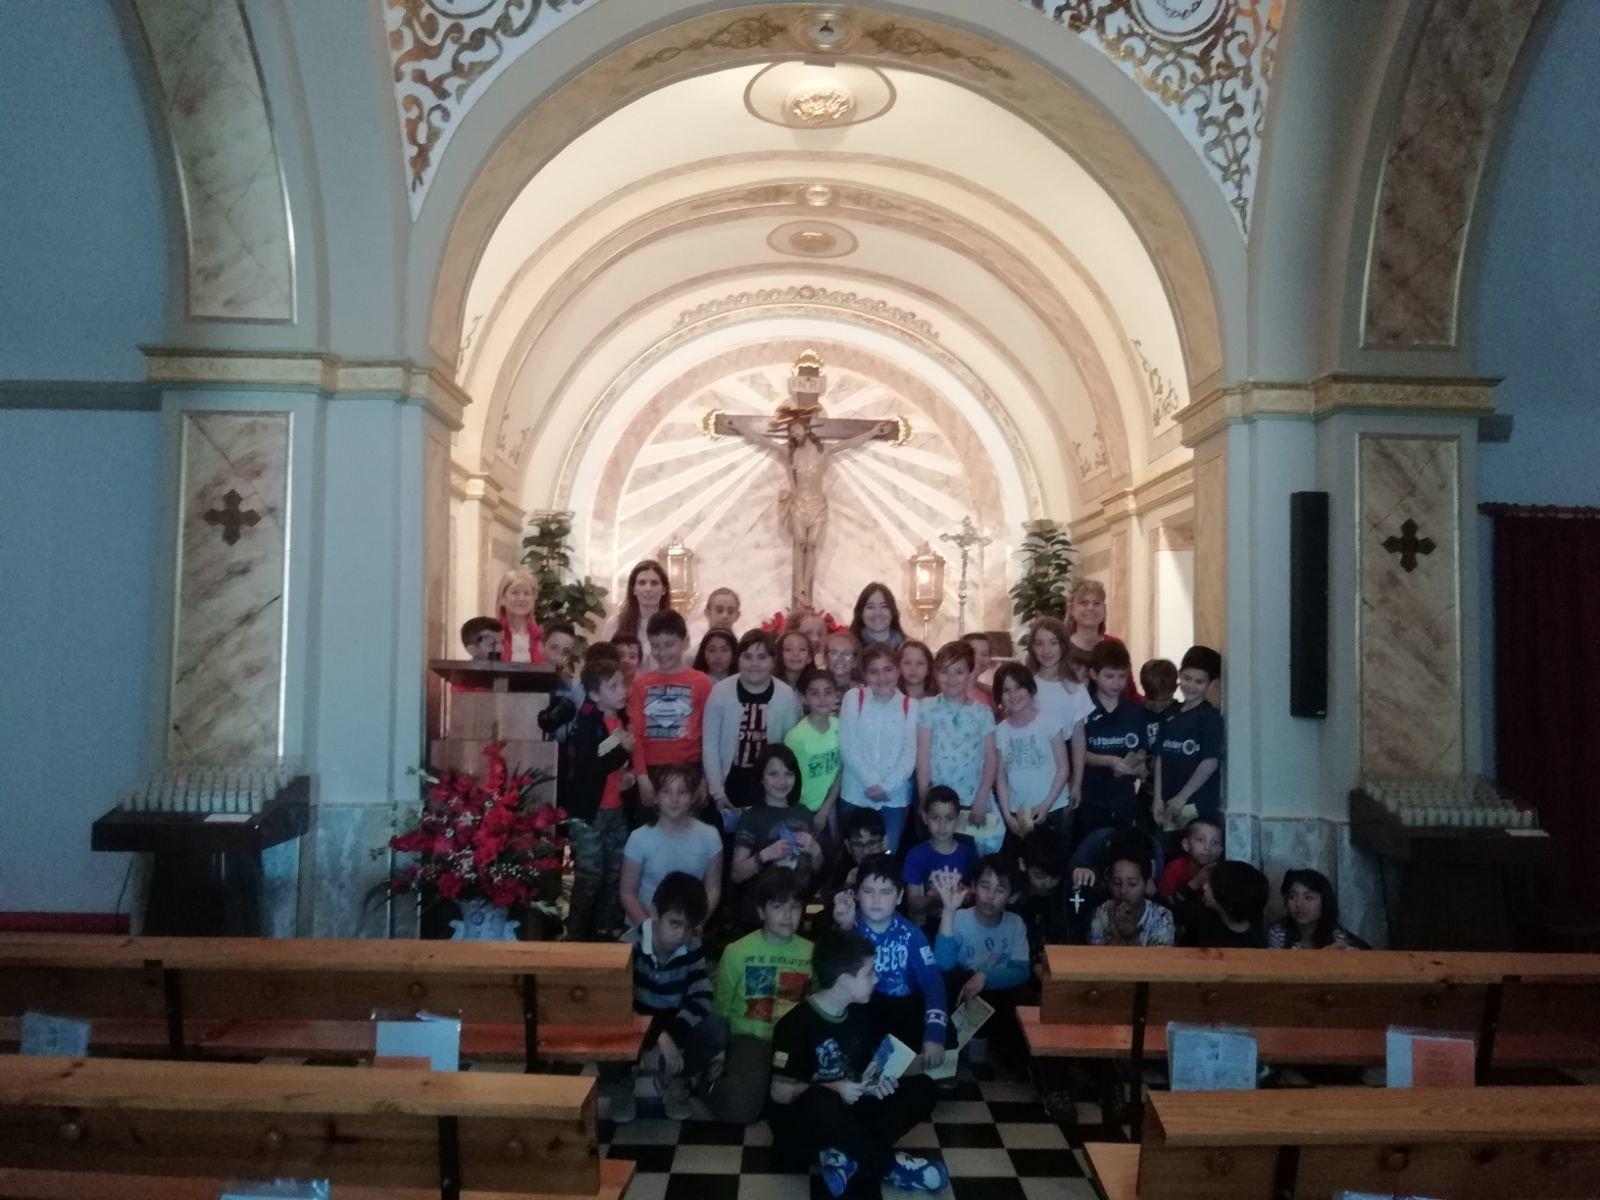 (2018-04-18) - Visita ermita alumnos Beatriz-Carmina-Lucía,3º,La Foia - María Isabel Berenguer Brotons - (08)